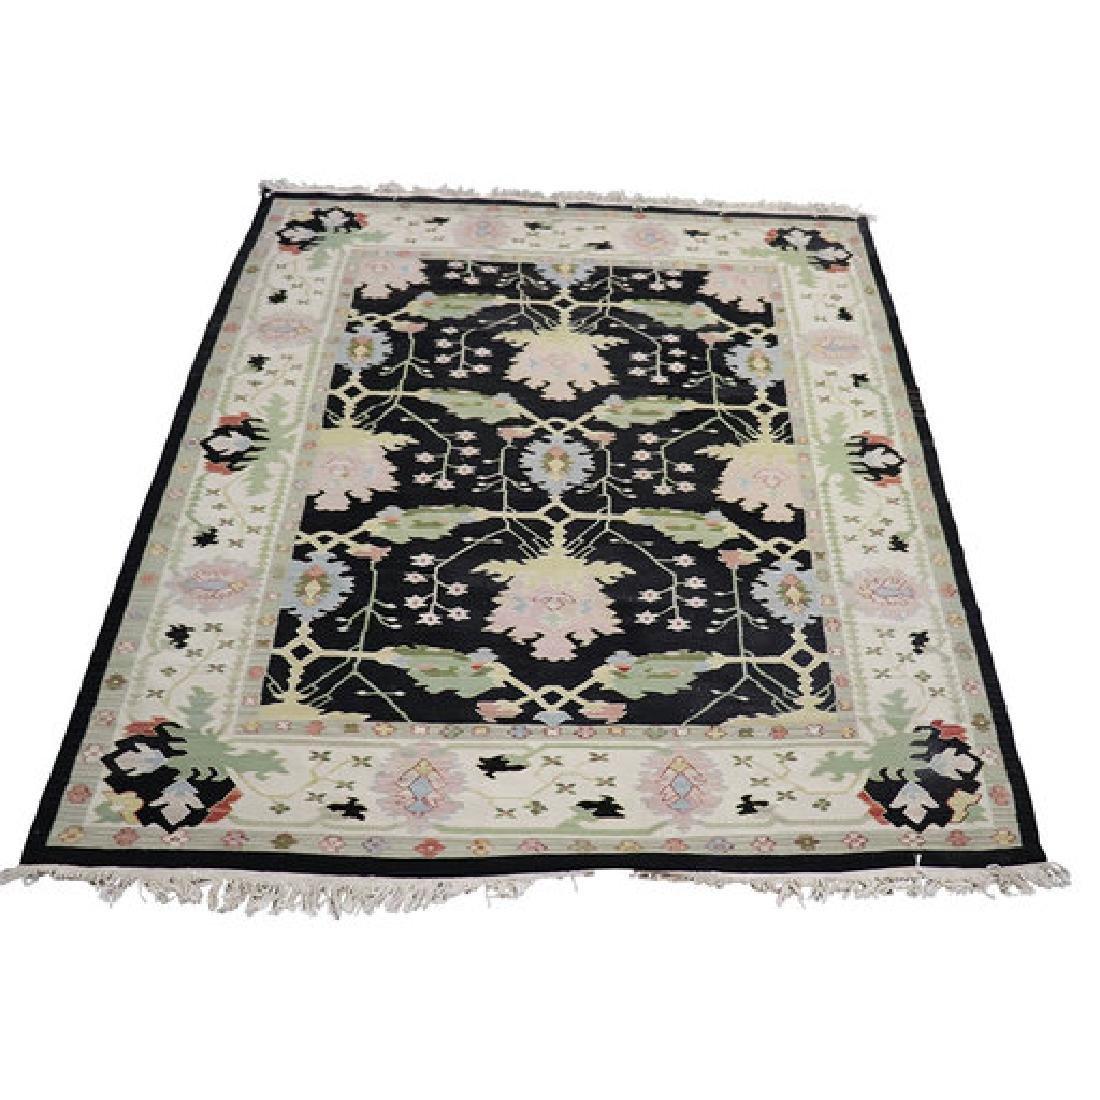 20th Century Handwoven Kilim Carpet Rug